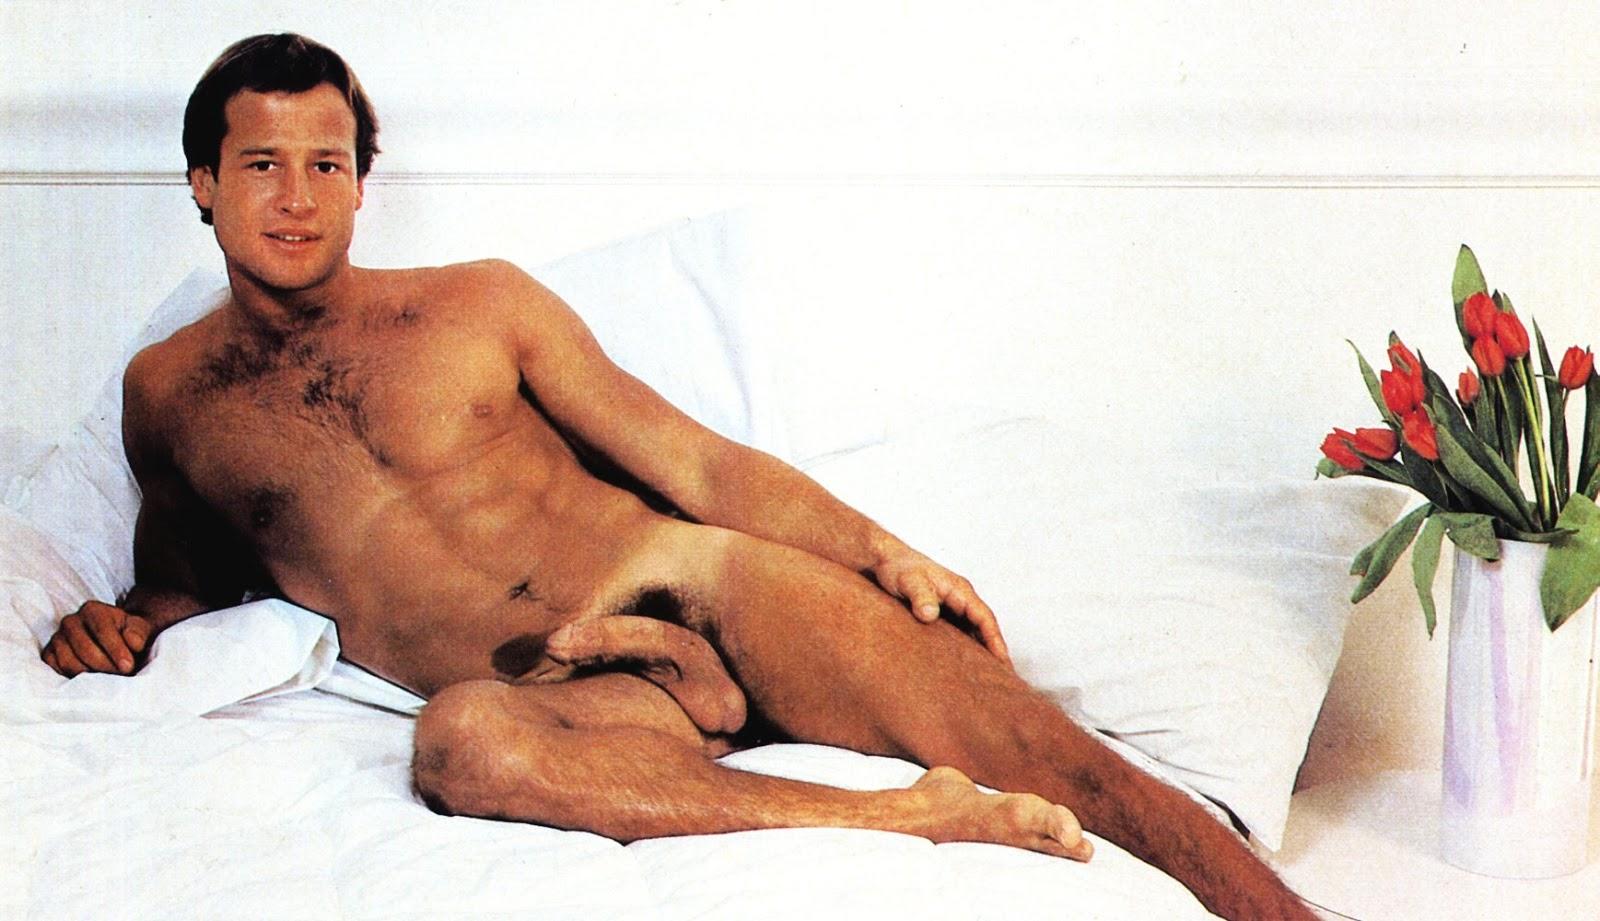 Nude Male Playgirl Centerfolds  Hot Girl Hd Wallpaper-9279